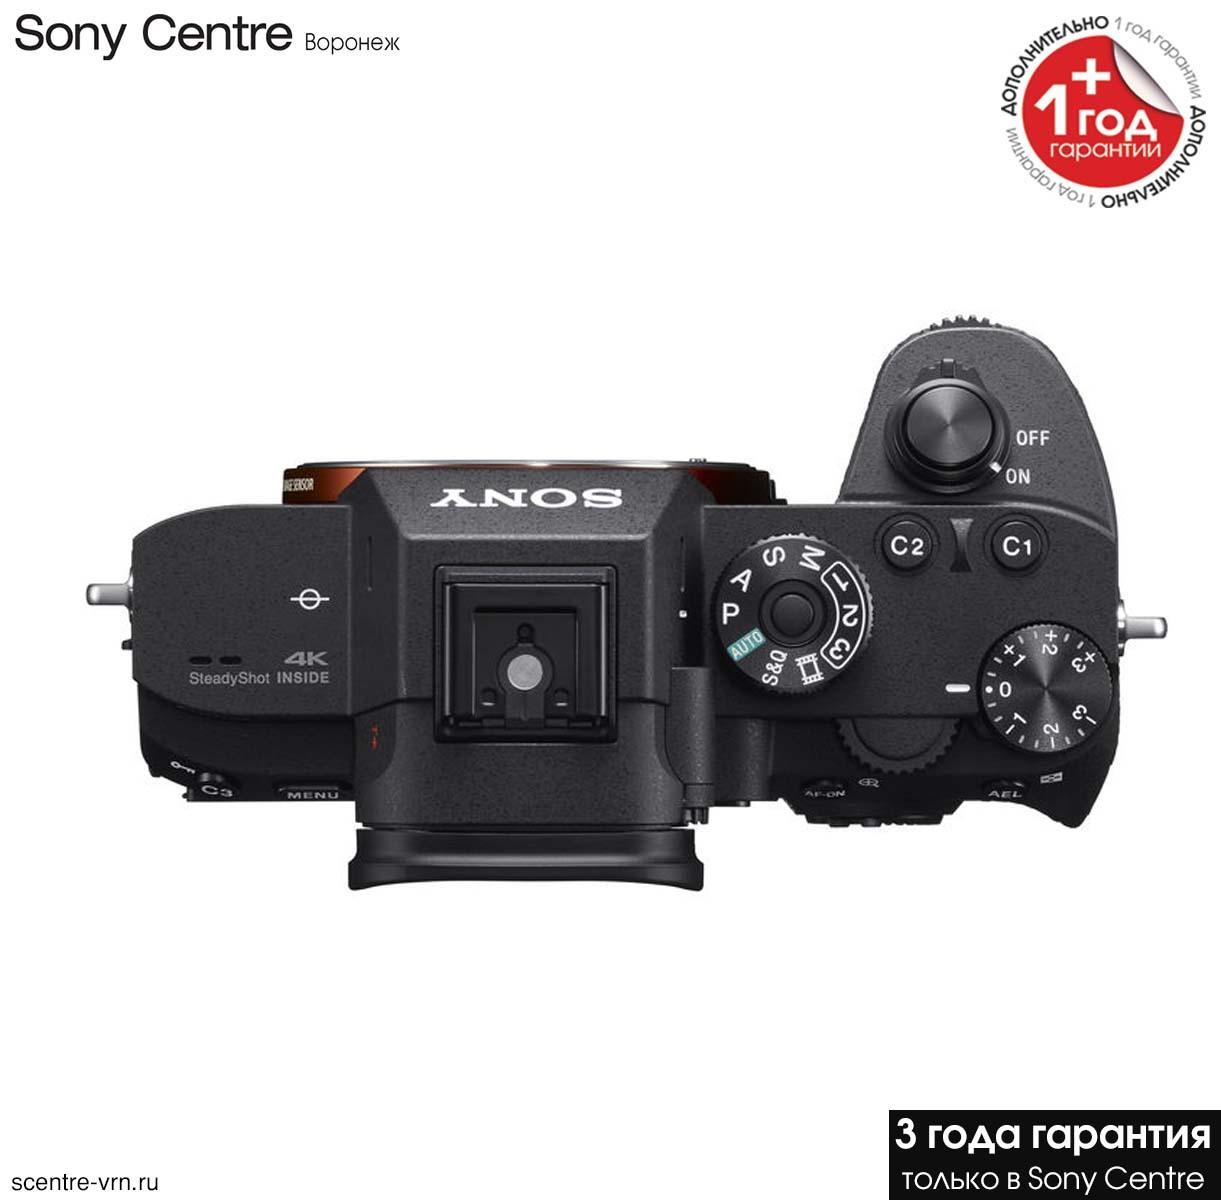 Sony Alpha ILCE-7RM3 купить в интернет-магазине Sony Centre Воронеж